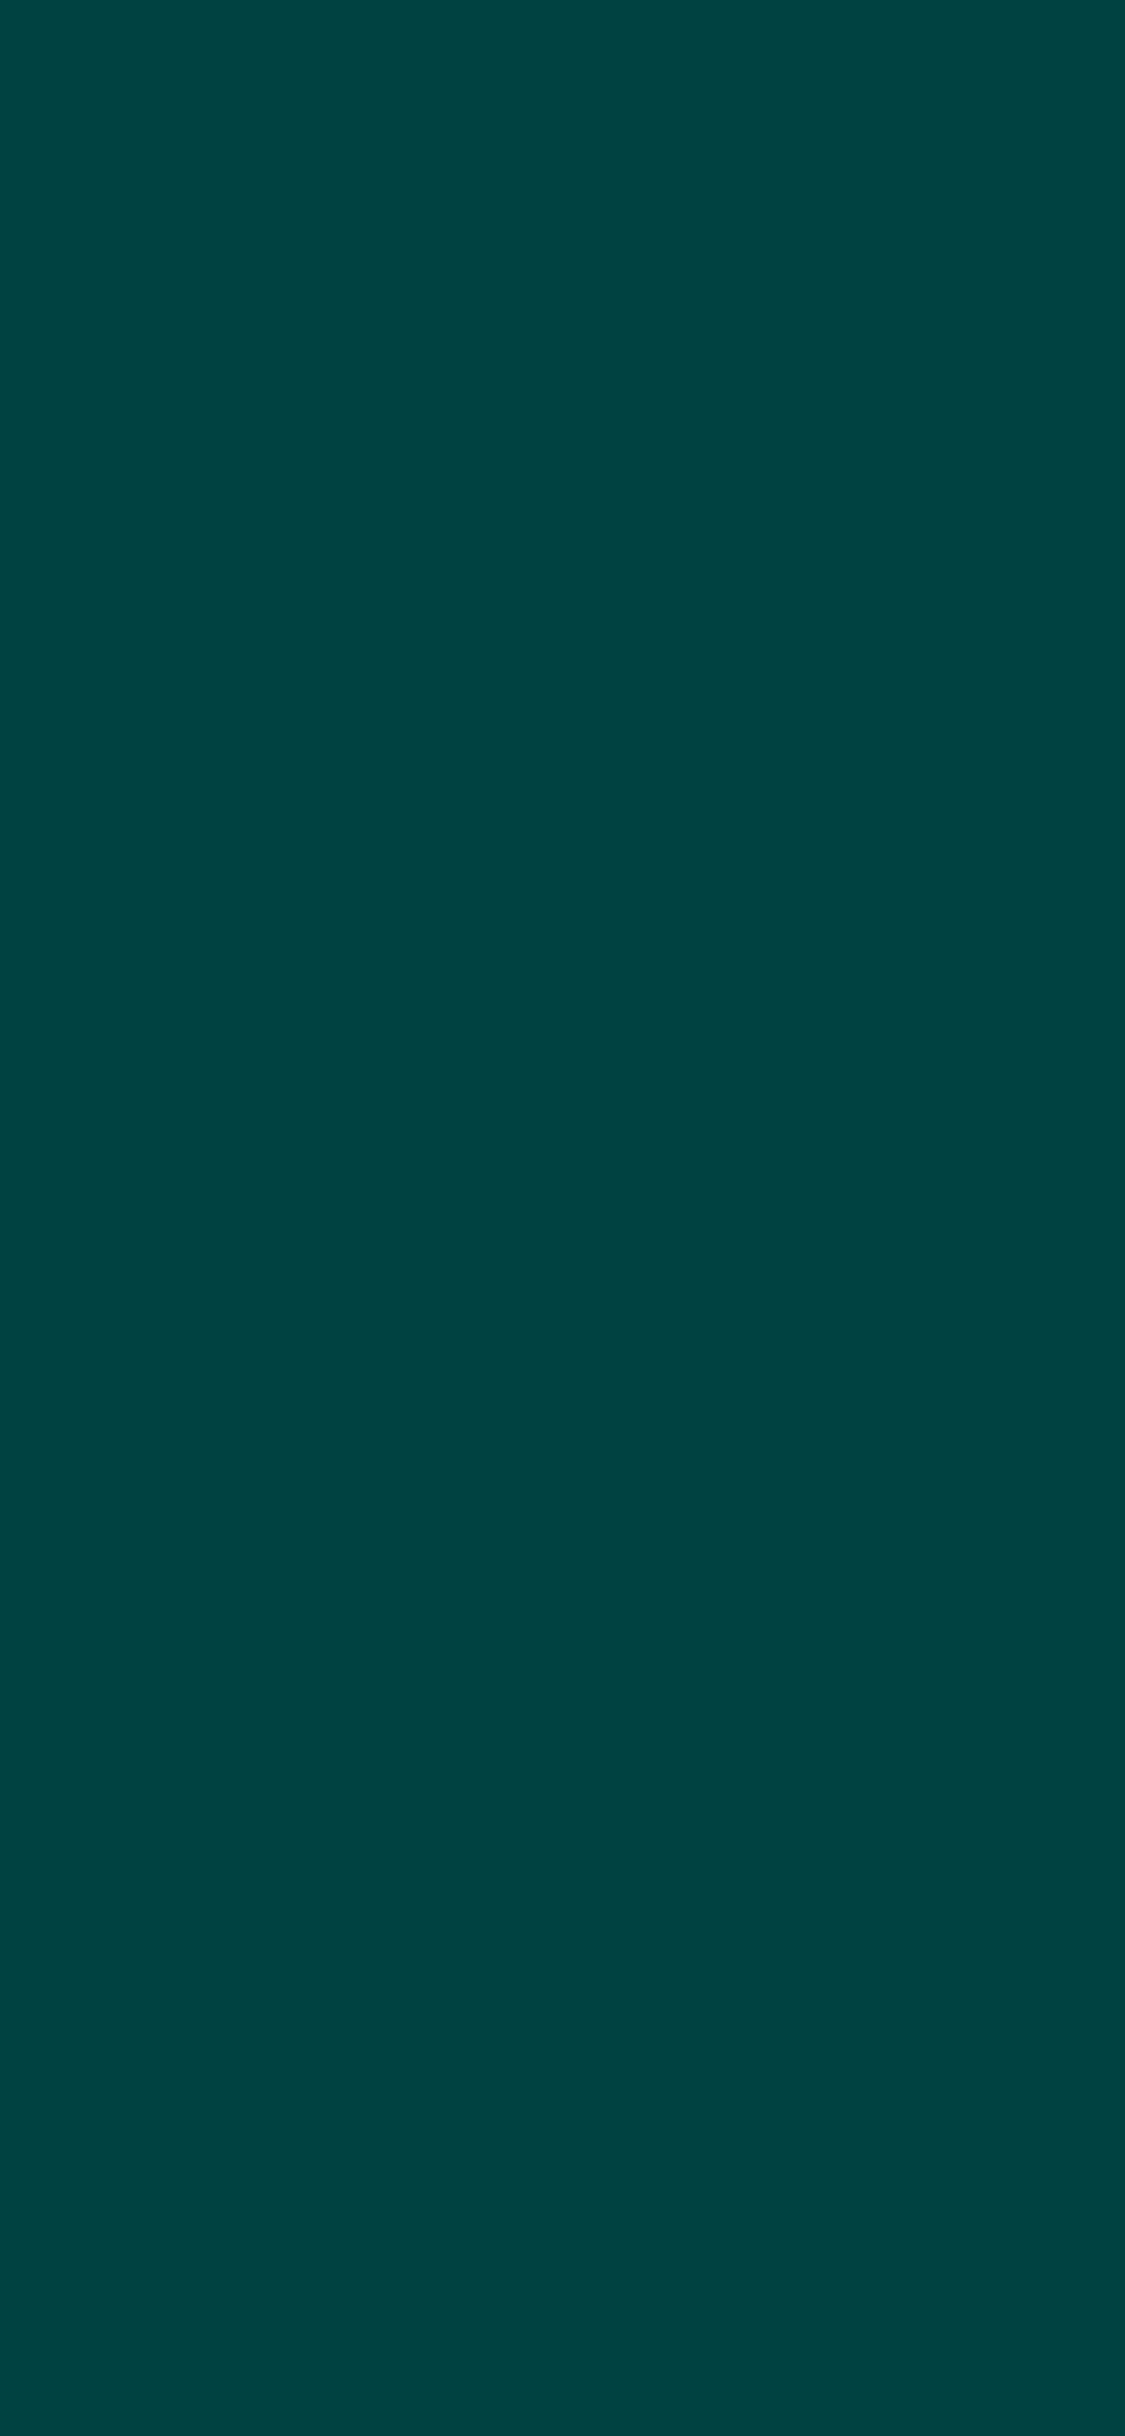 1125x2436 Warm Black Solid Color Background